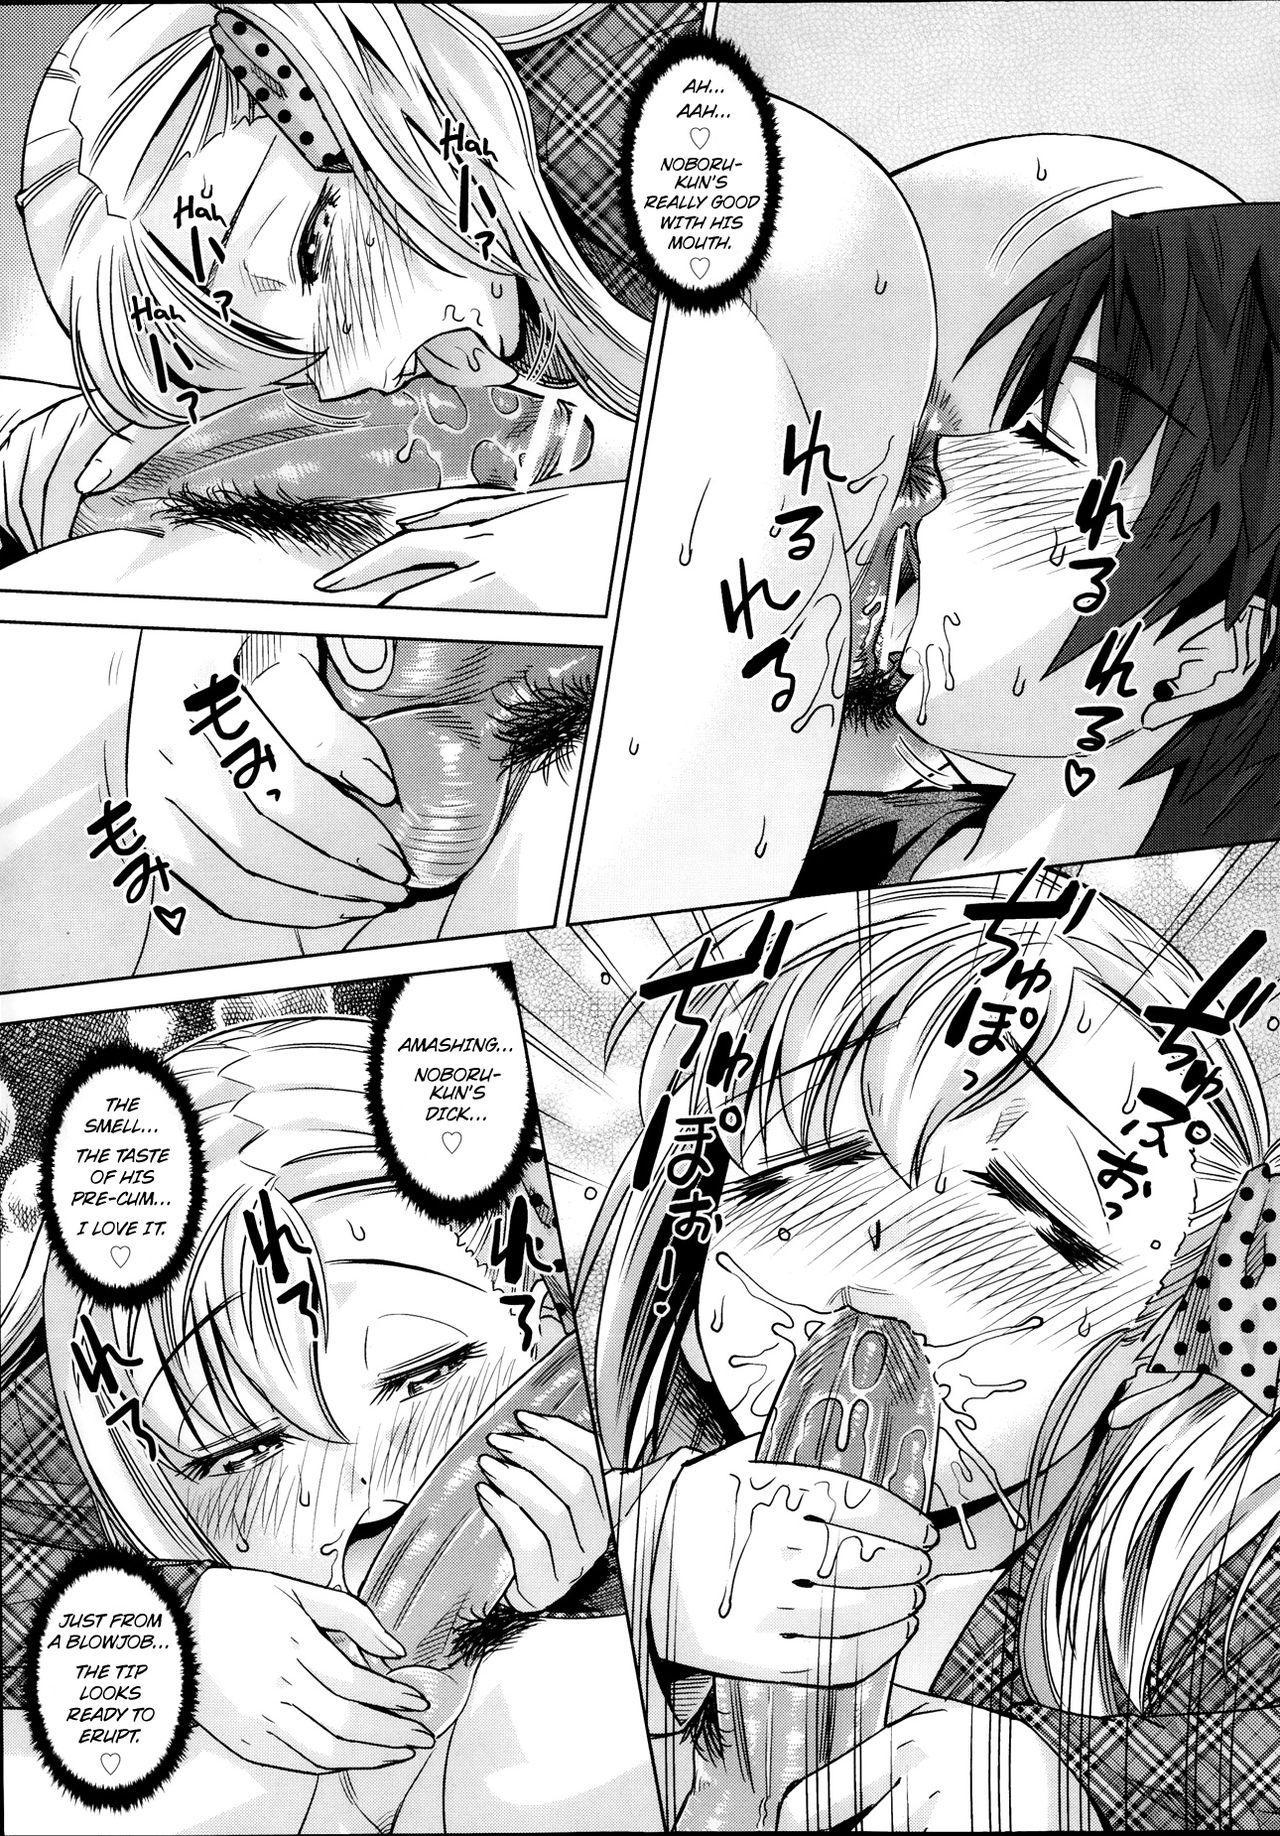 Motomu! Kanbyou | I Want It! Nurse Me 14